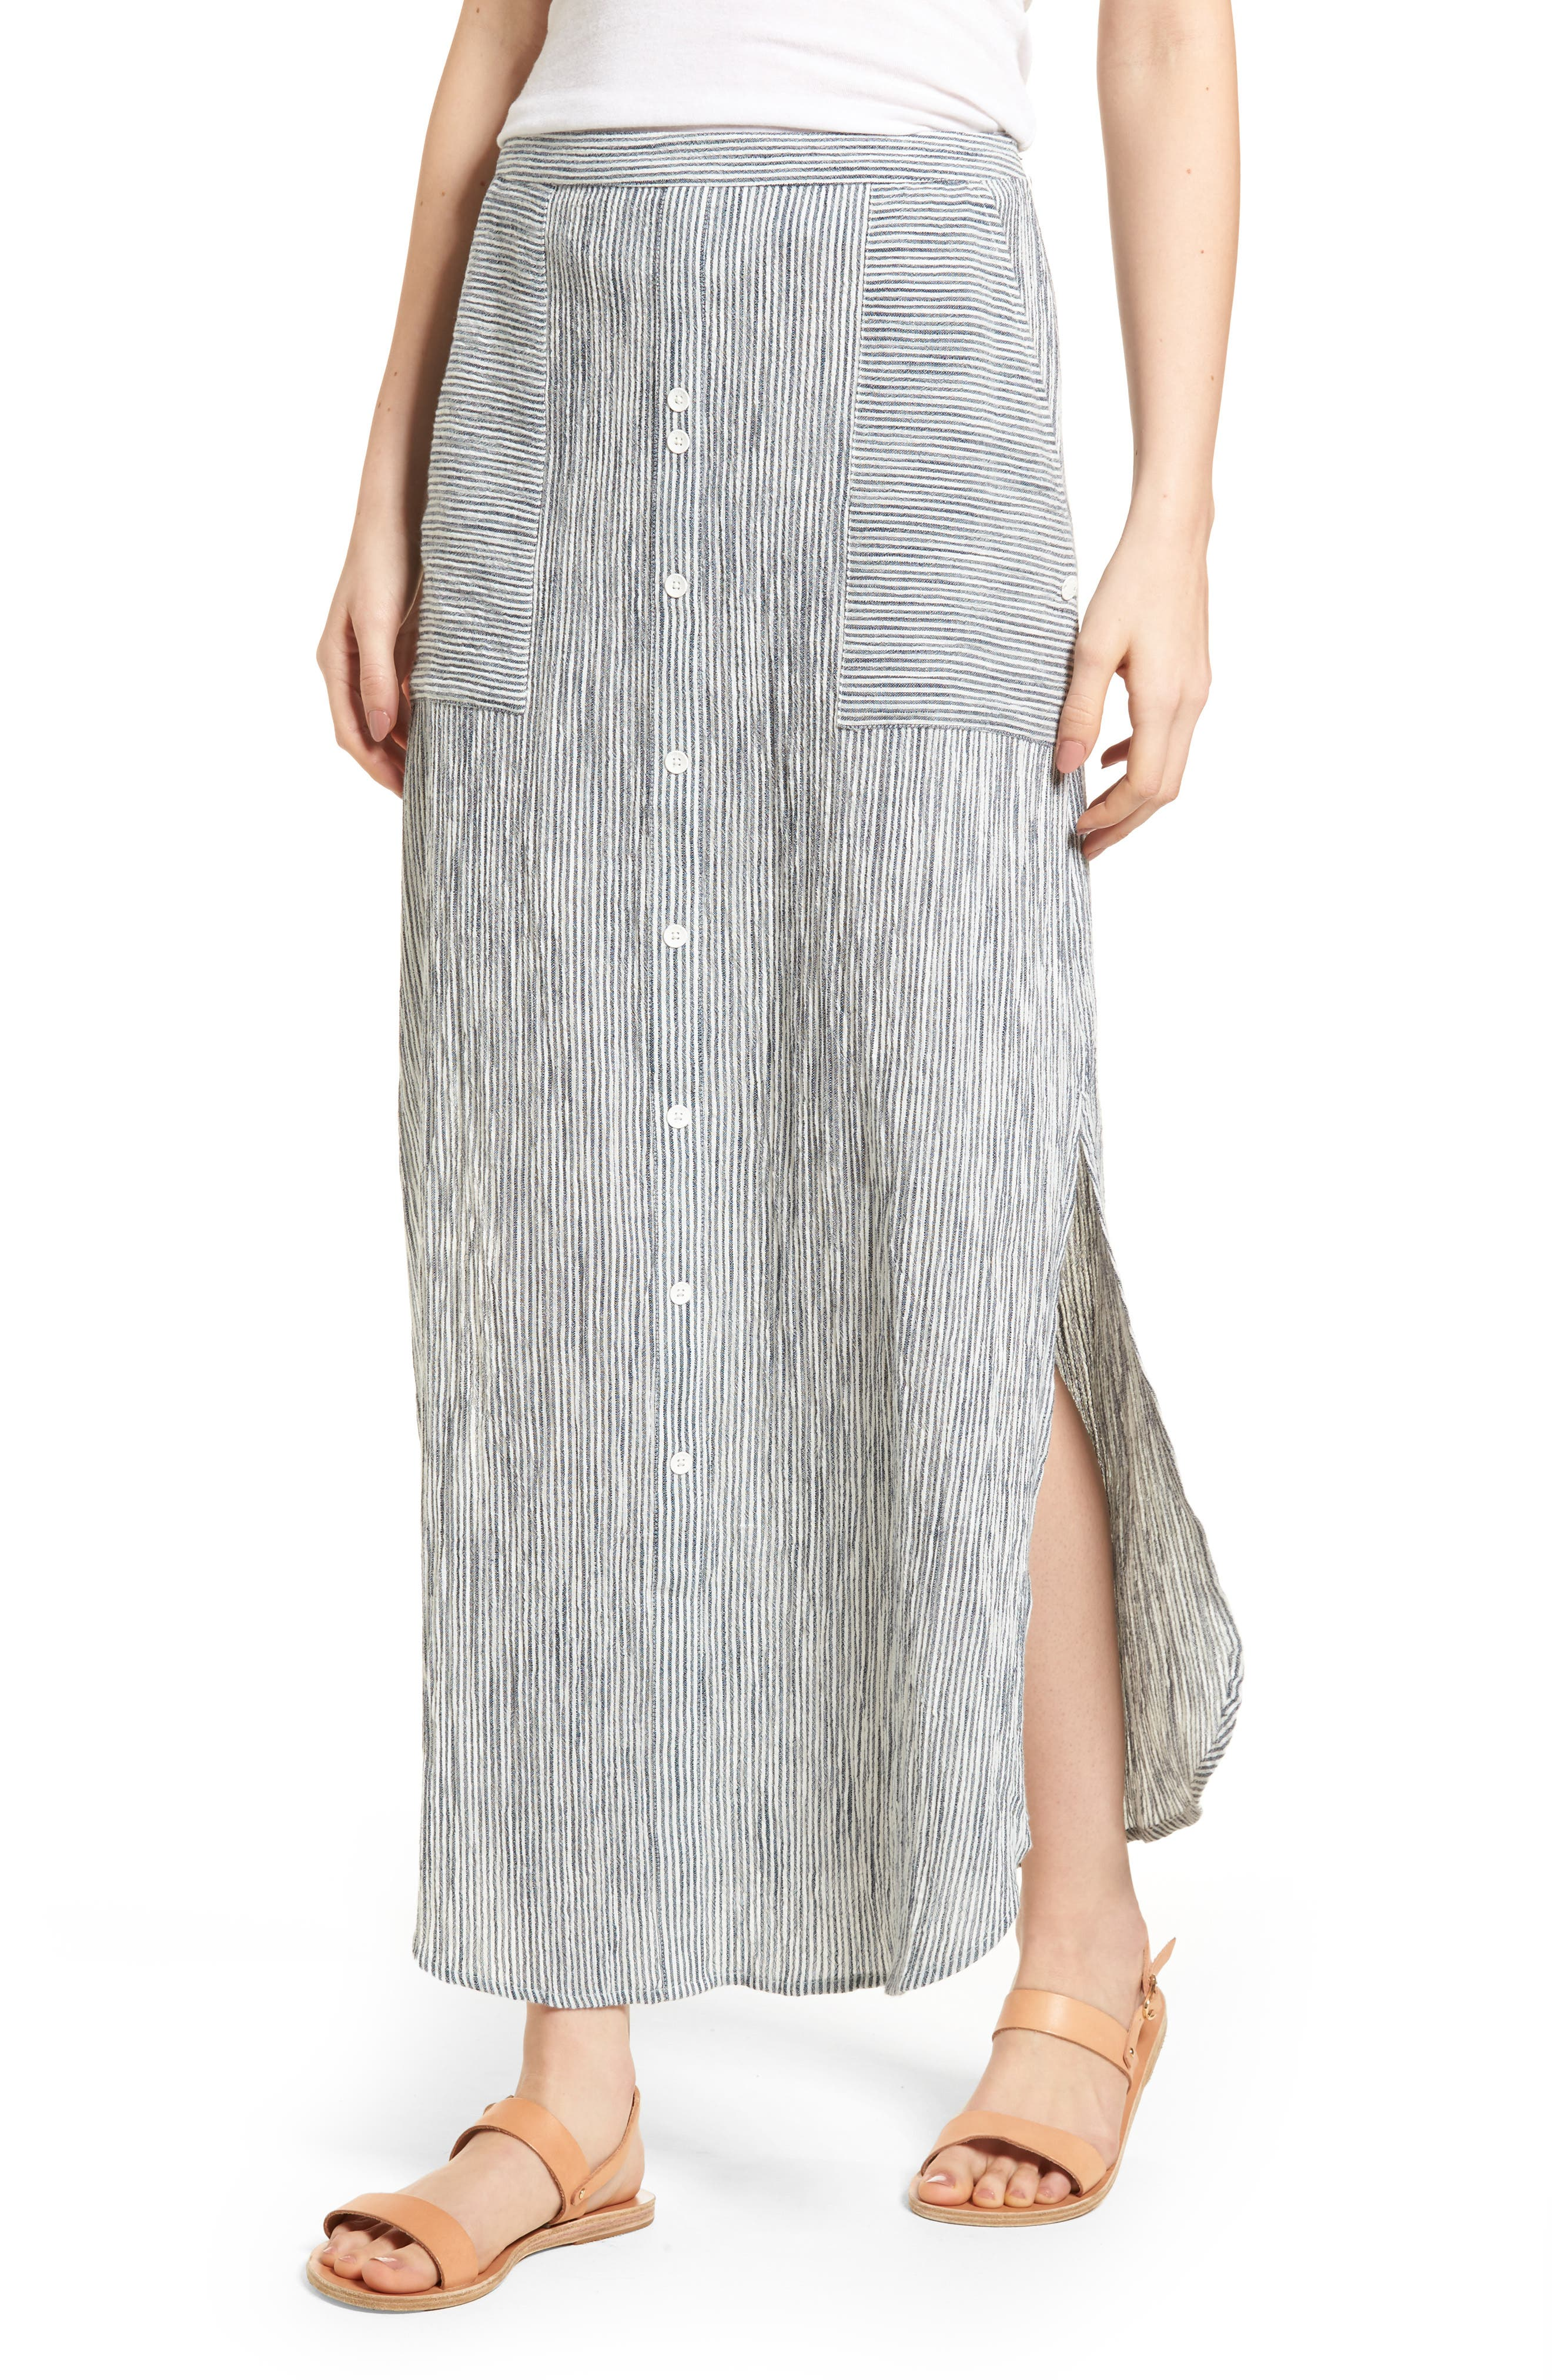 Sunset Islands Pinstripe Maxi Skirt,                             Main thumbnail 1, color,